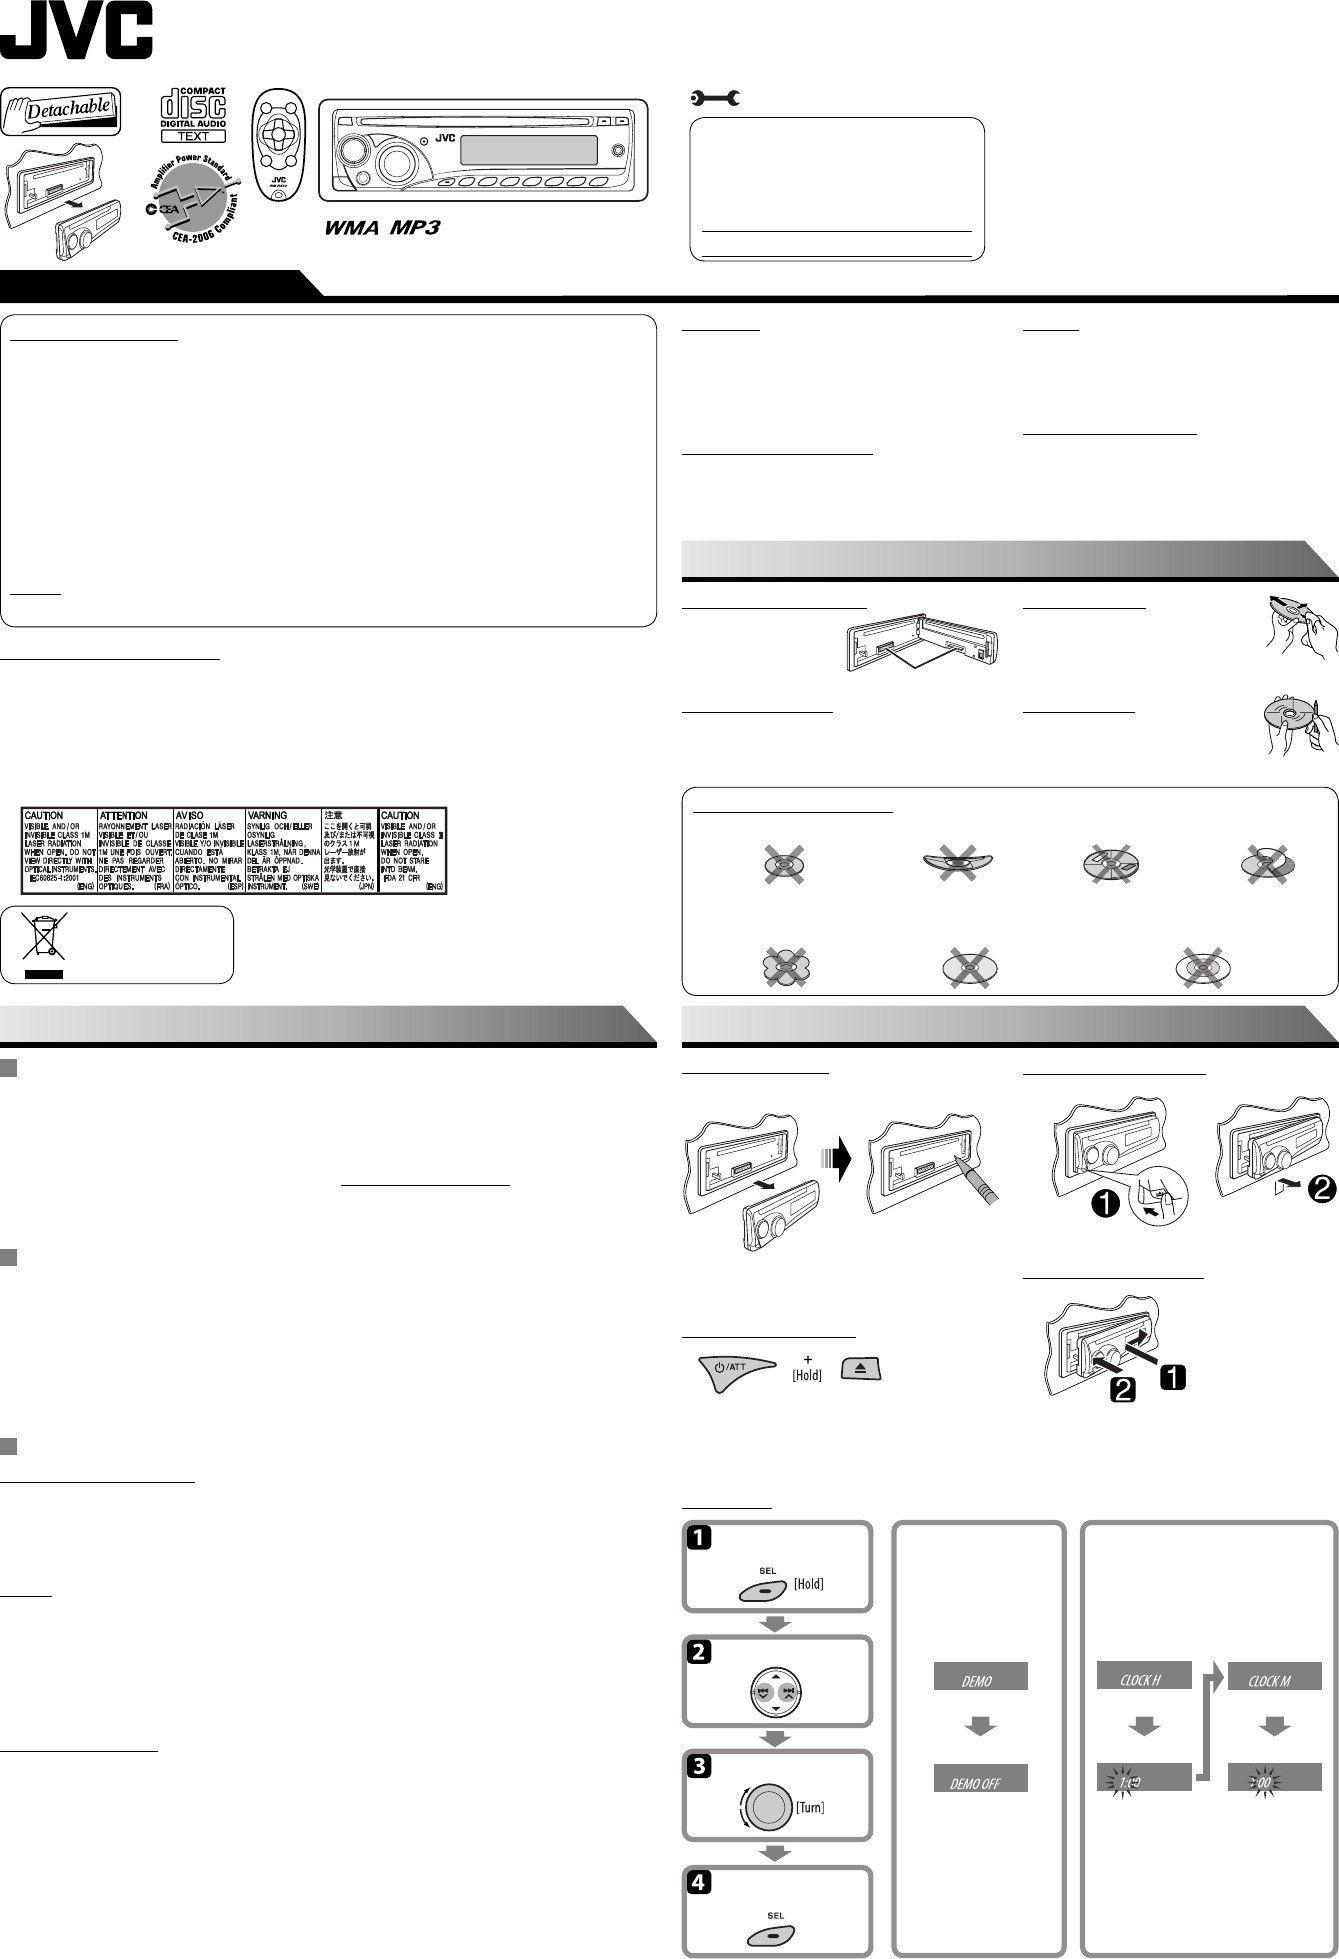 Jvc Kd-r330 Wiring Diagram : kd-r330, wiring, diagram, Wiring, Diagram, Units,